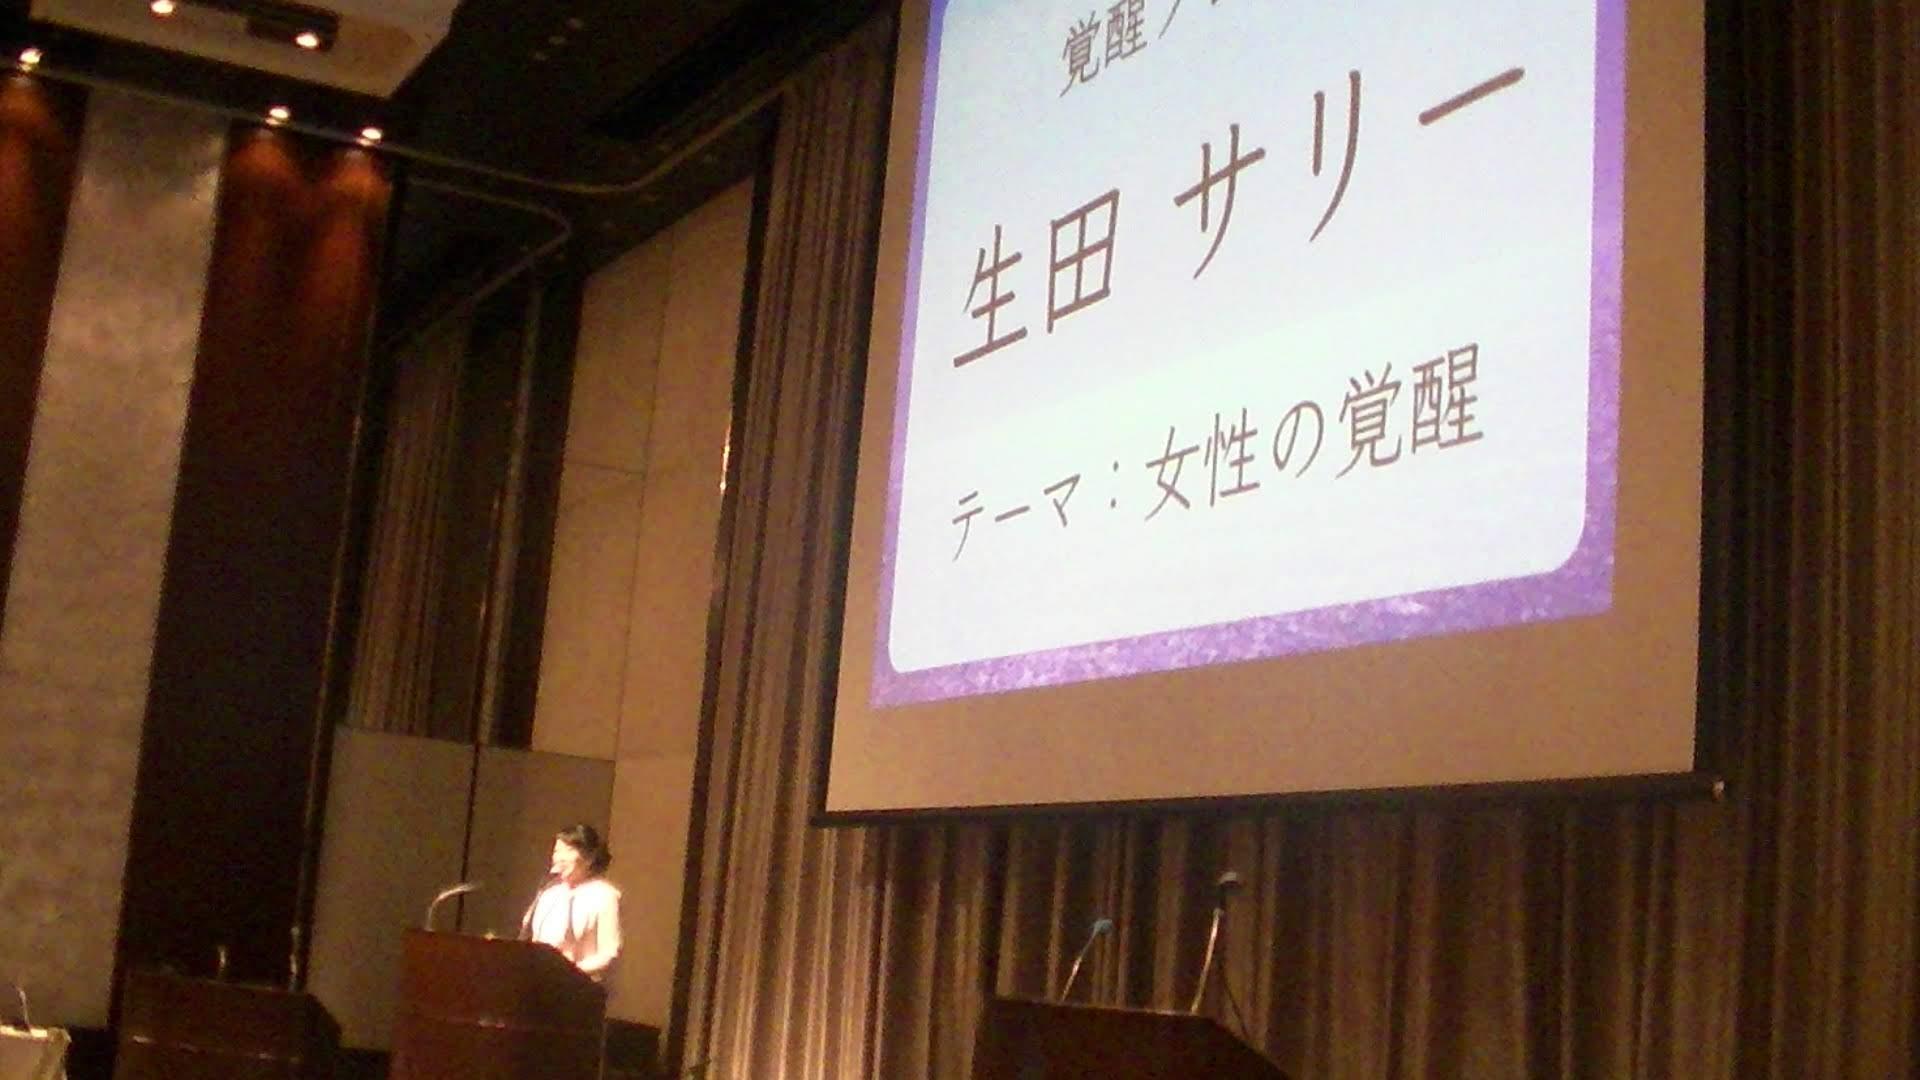 PIC 1763 1 - 思風会全国大会in広島